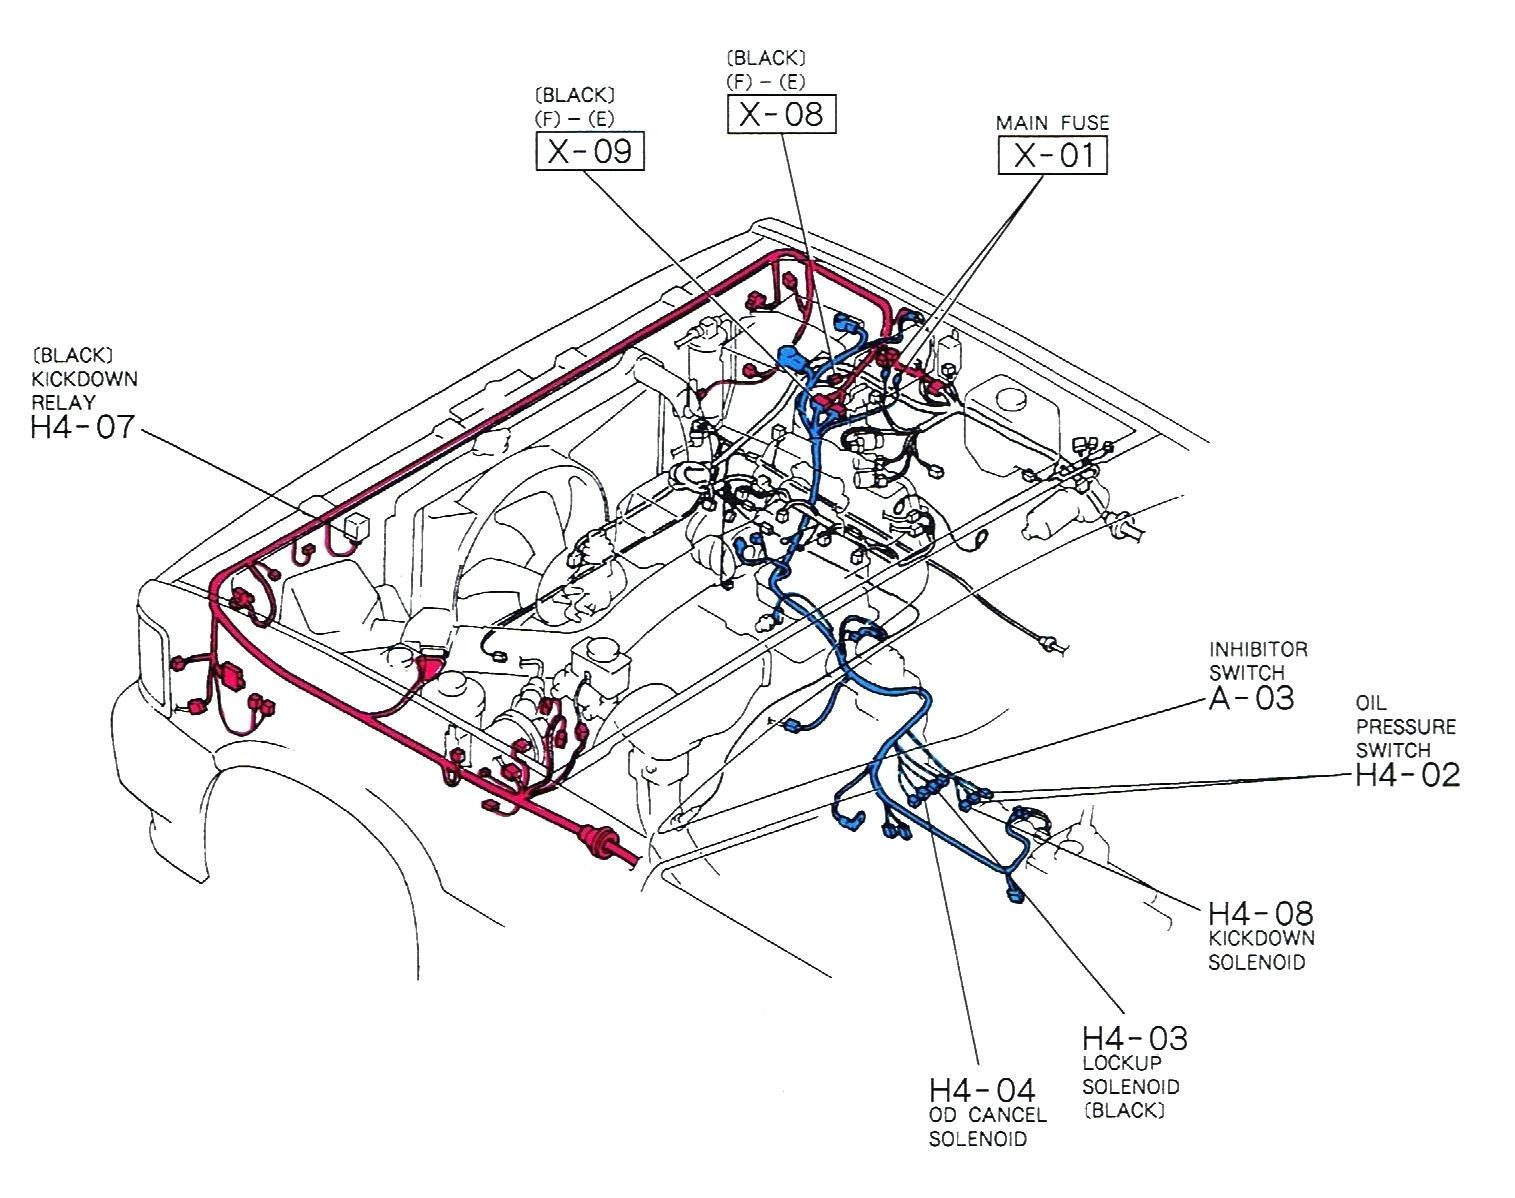 High Pressure sodium Wiring Diagram Bg 0697 150 Watt Halide Lamp Wiring Diagram Wiring Diagram